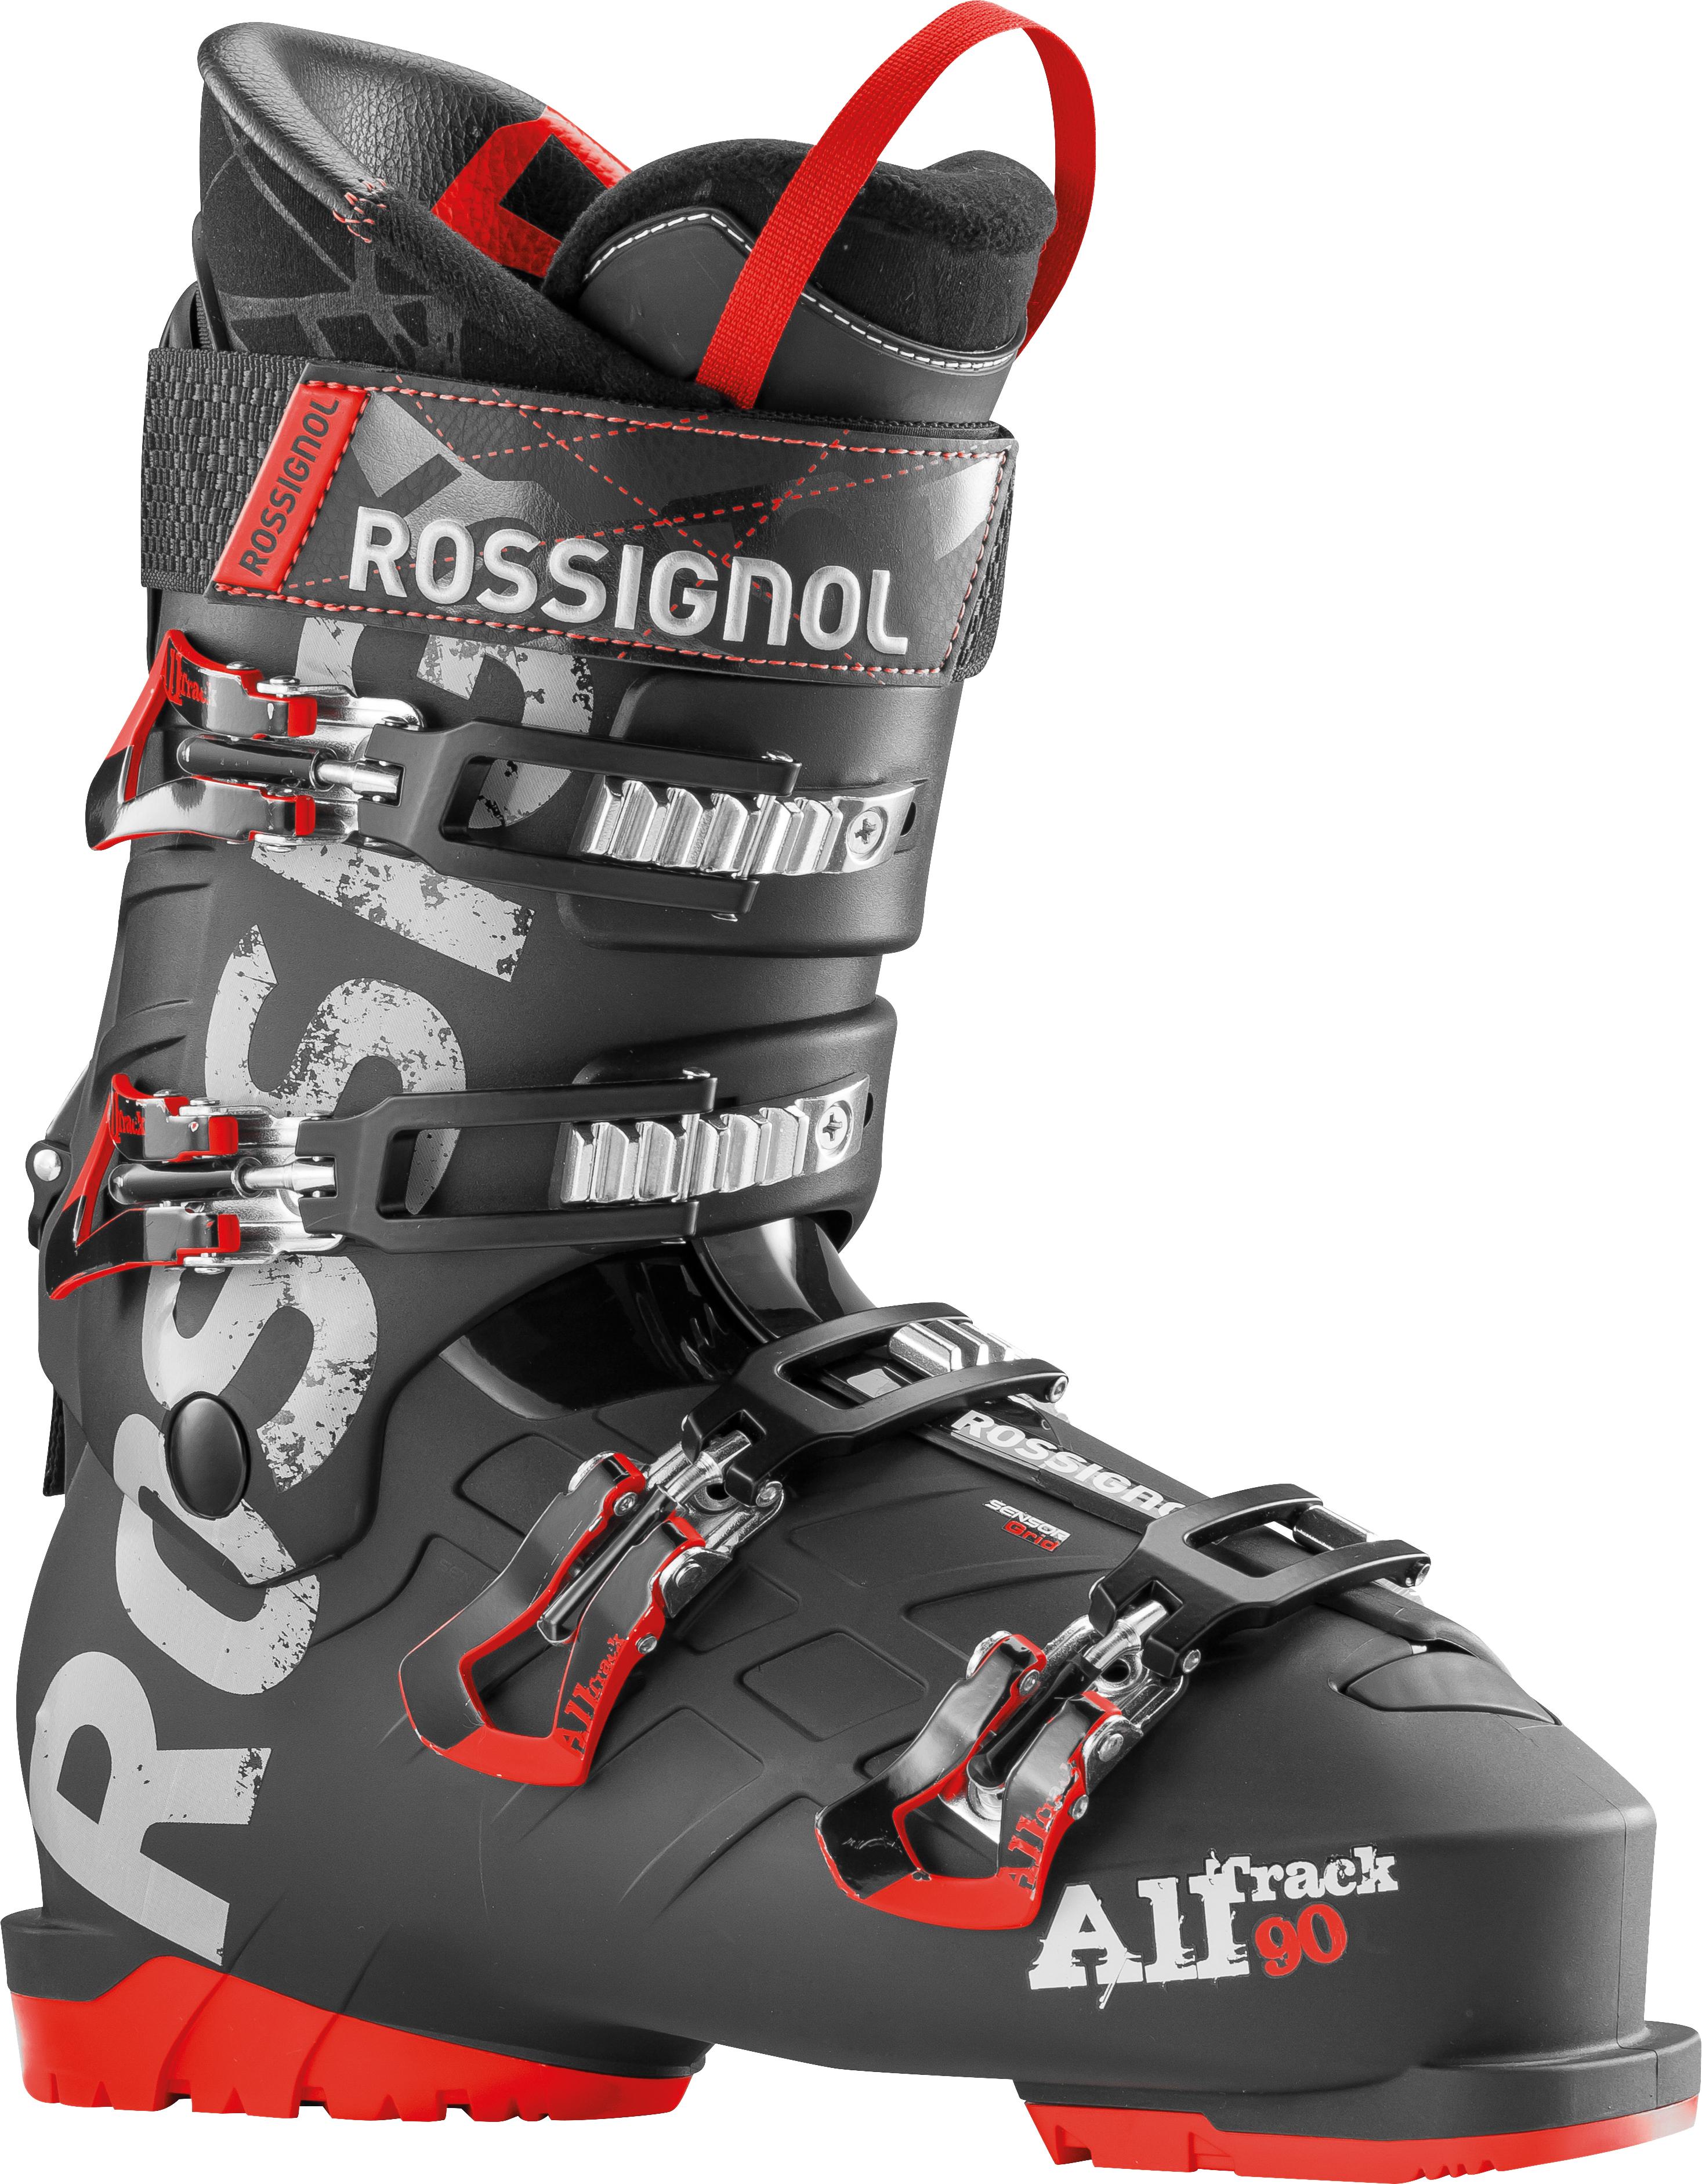 Bottes de ski Alltrack 90 de Rossignol Hommes